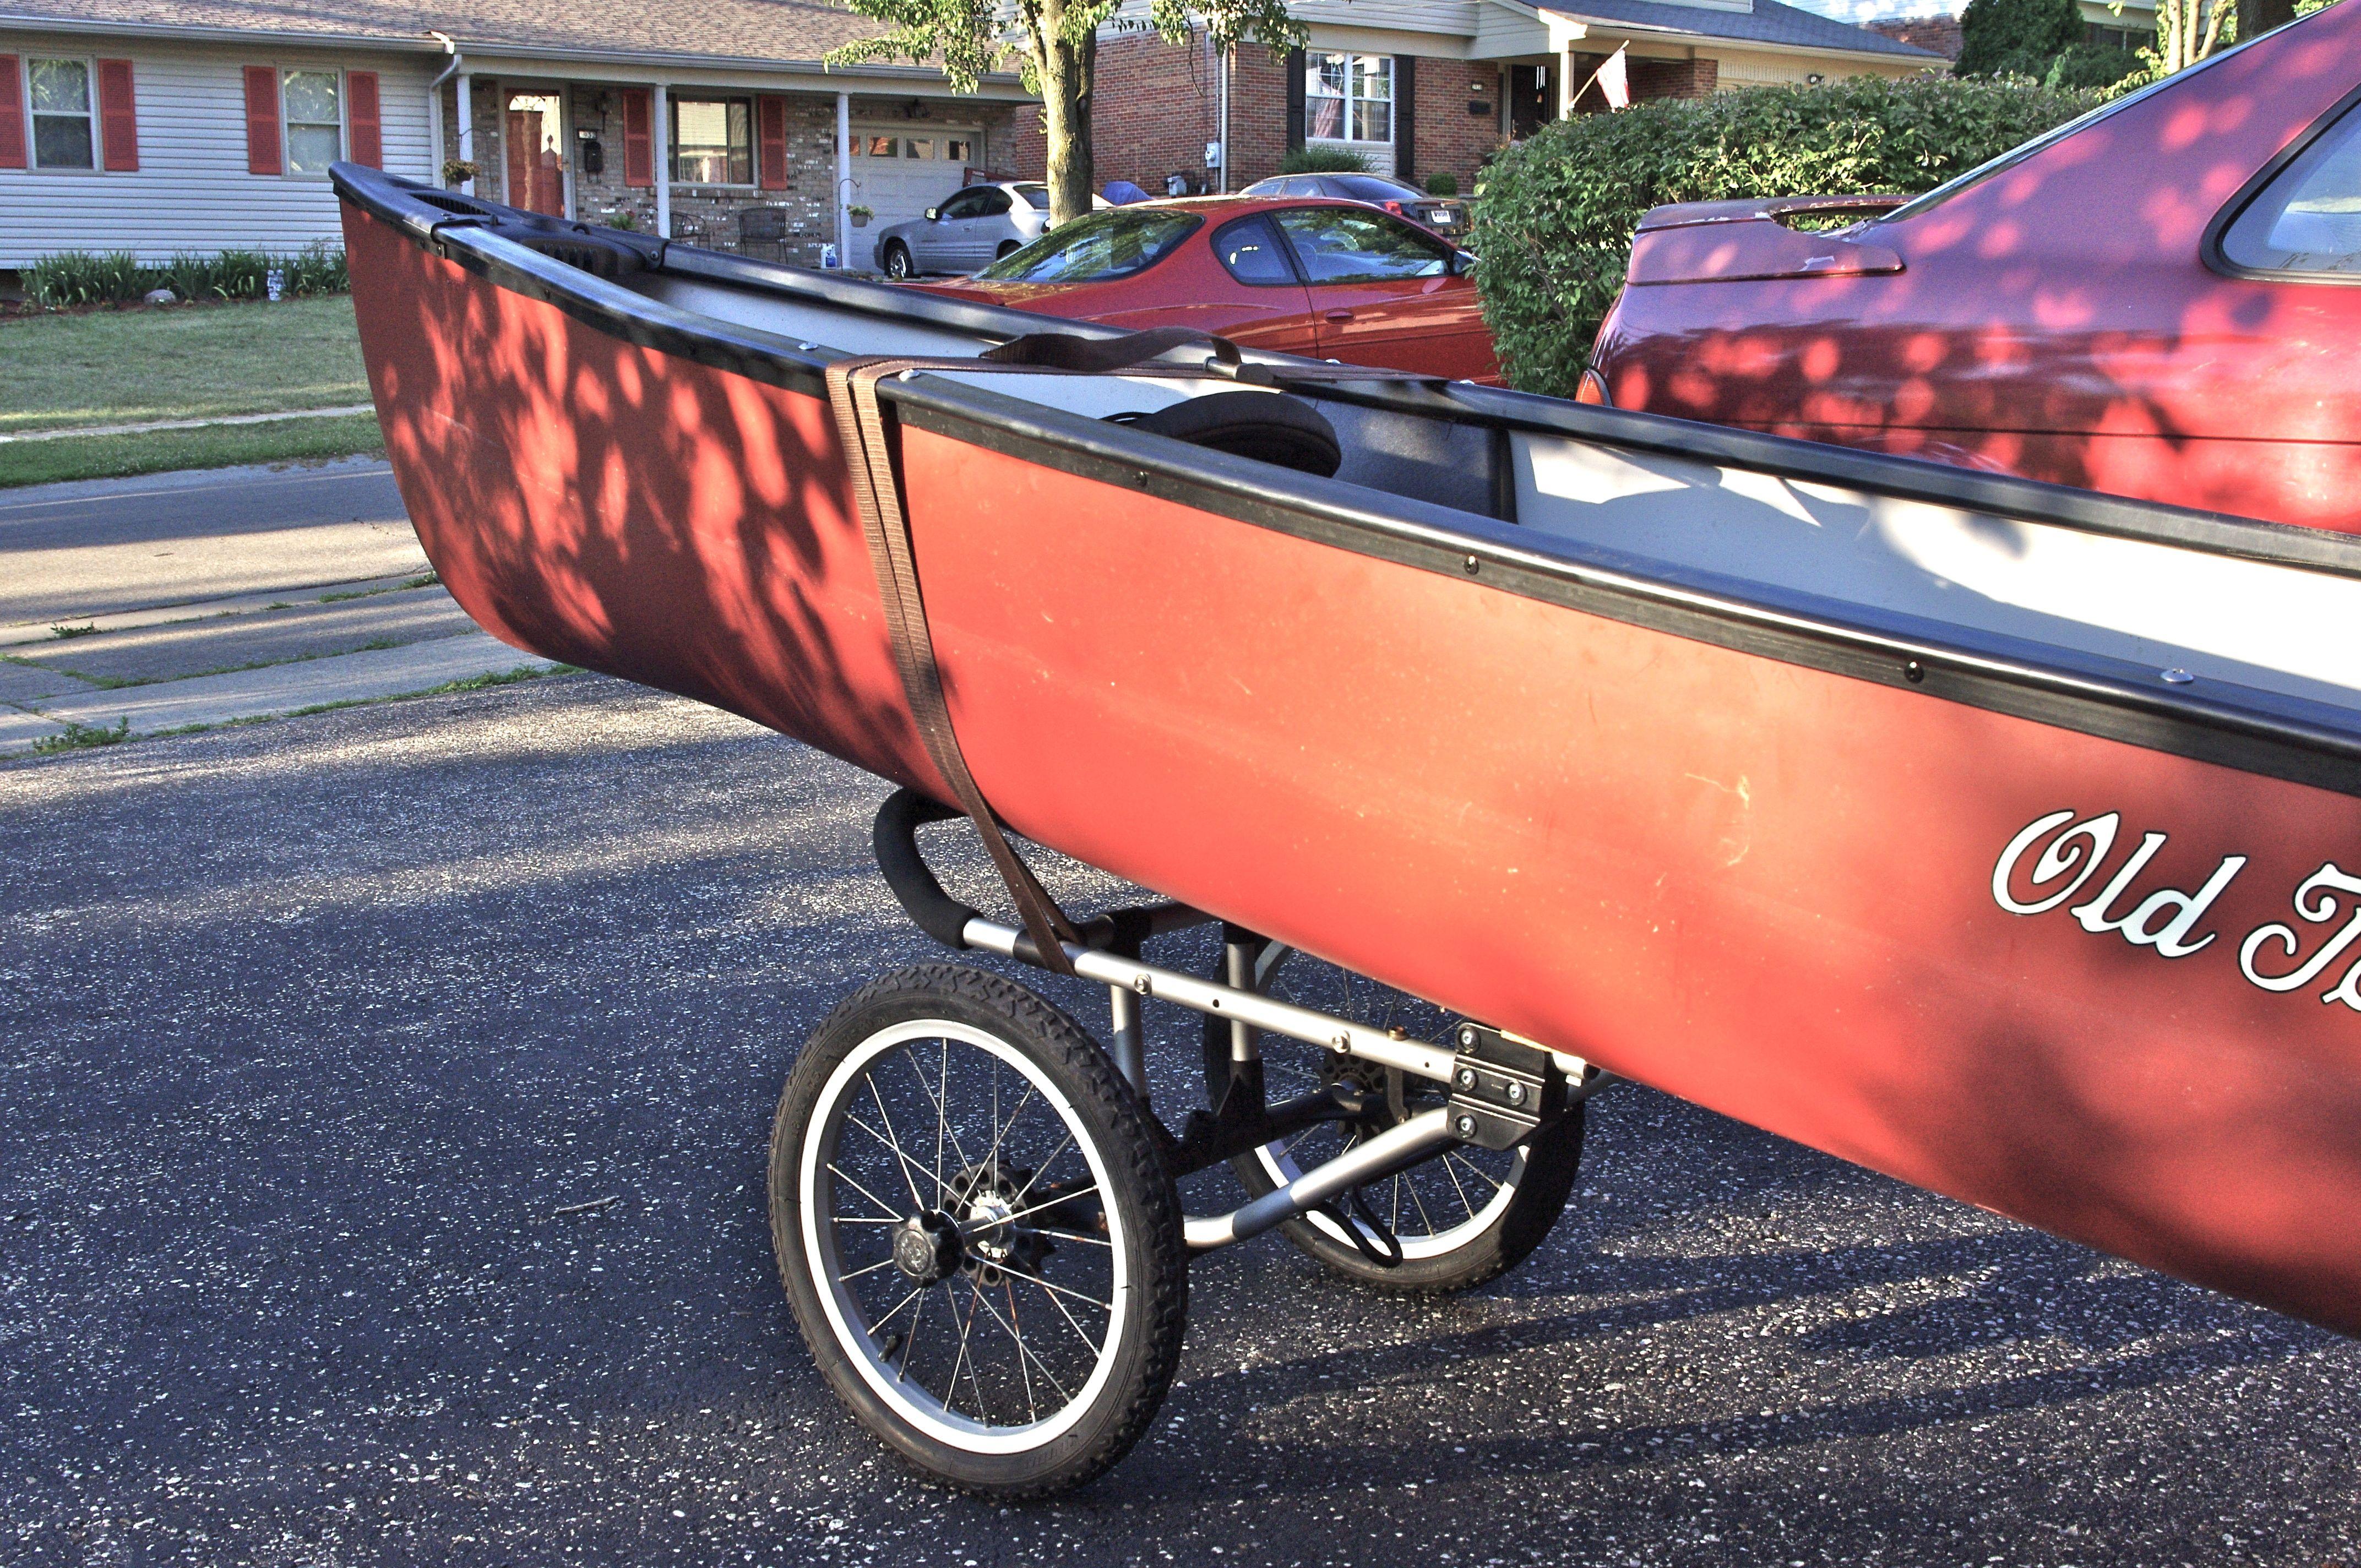 Canoe/Kayak Caddy mod from a Jogging Stroller